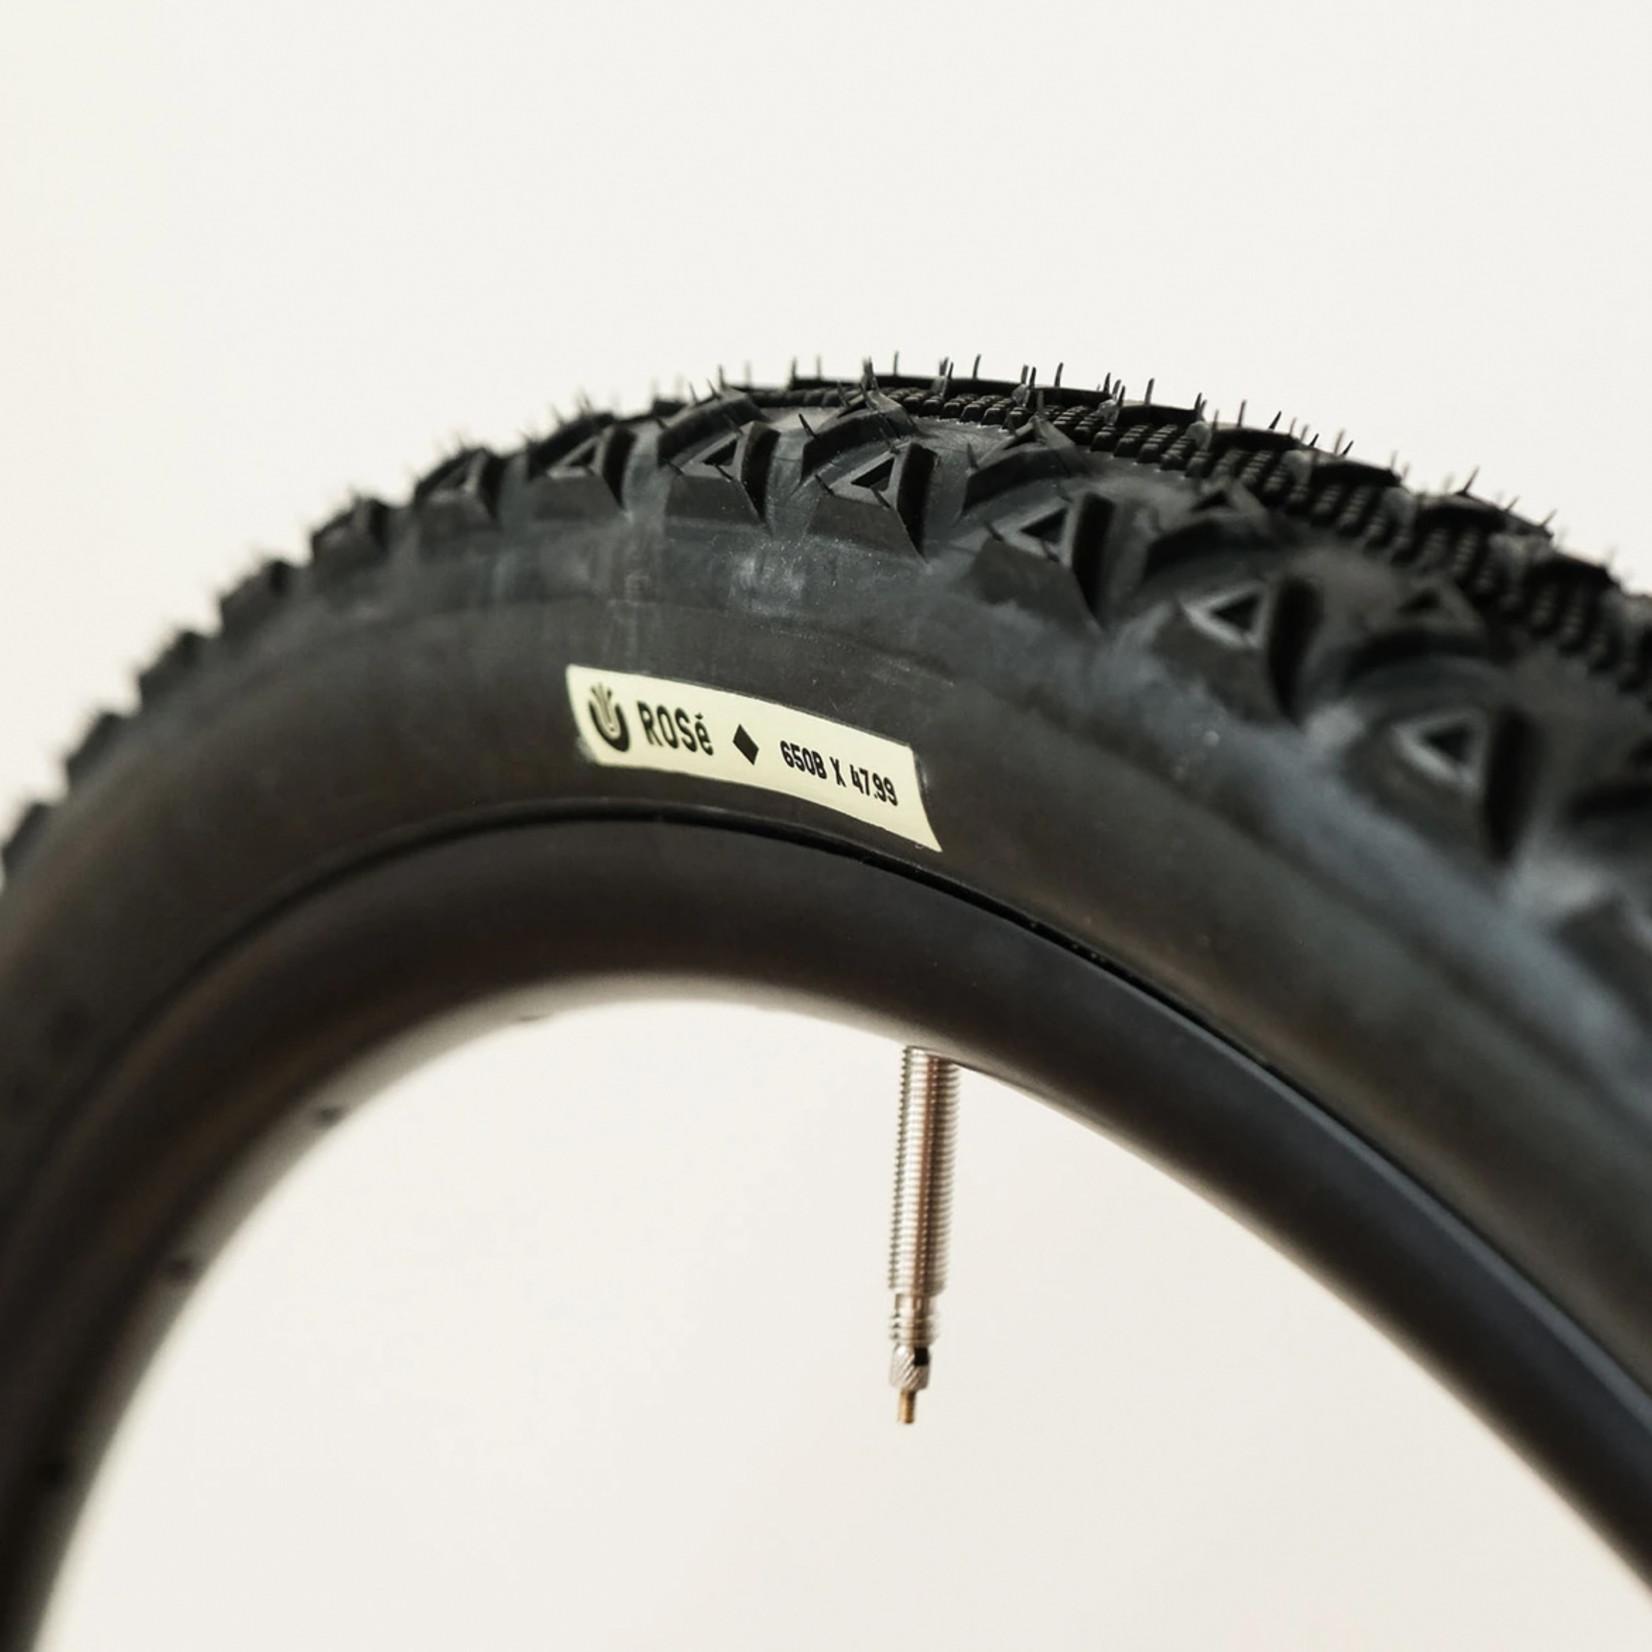 Ultradynamico Tires - Rose Robusto - 650b x 48